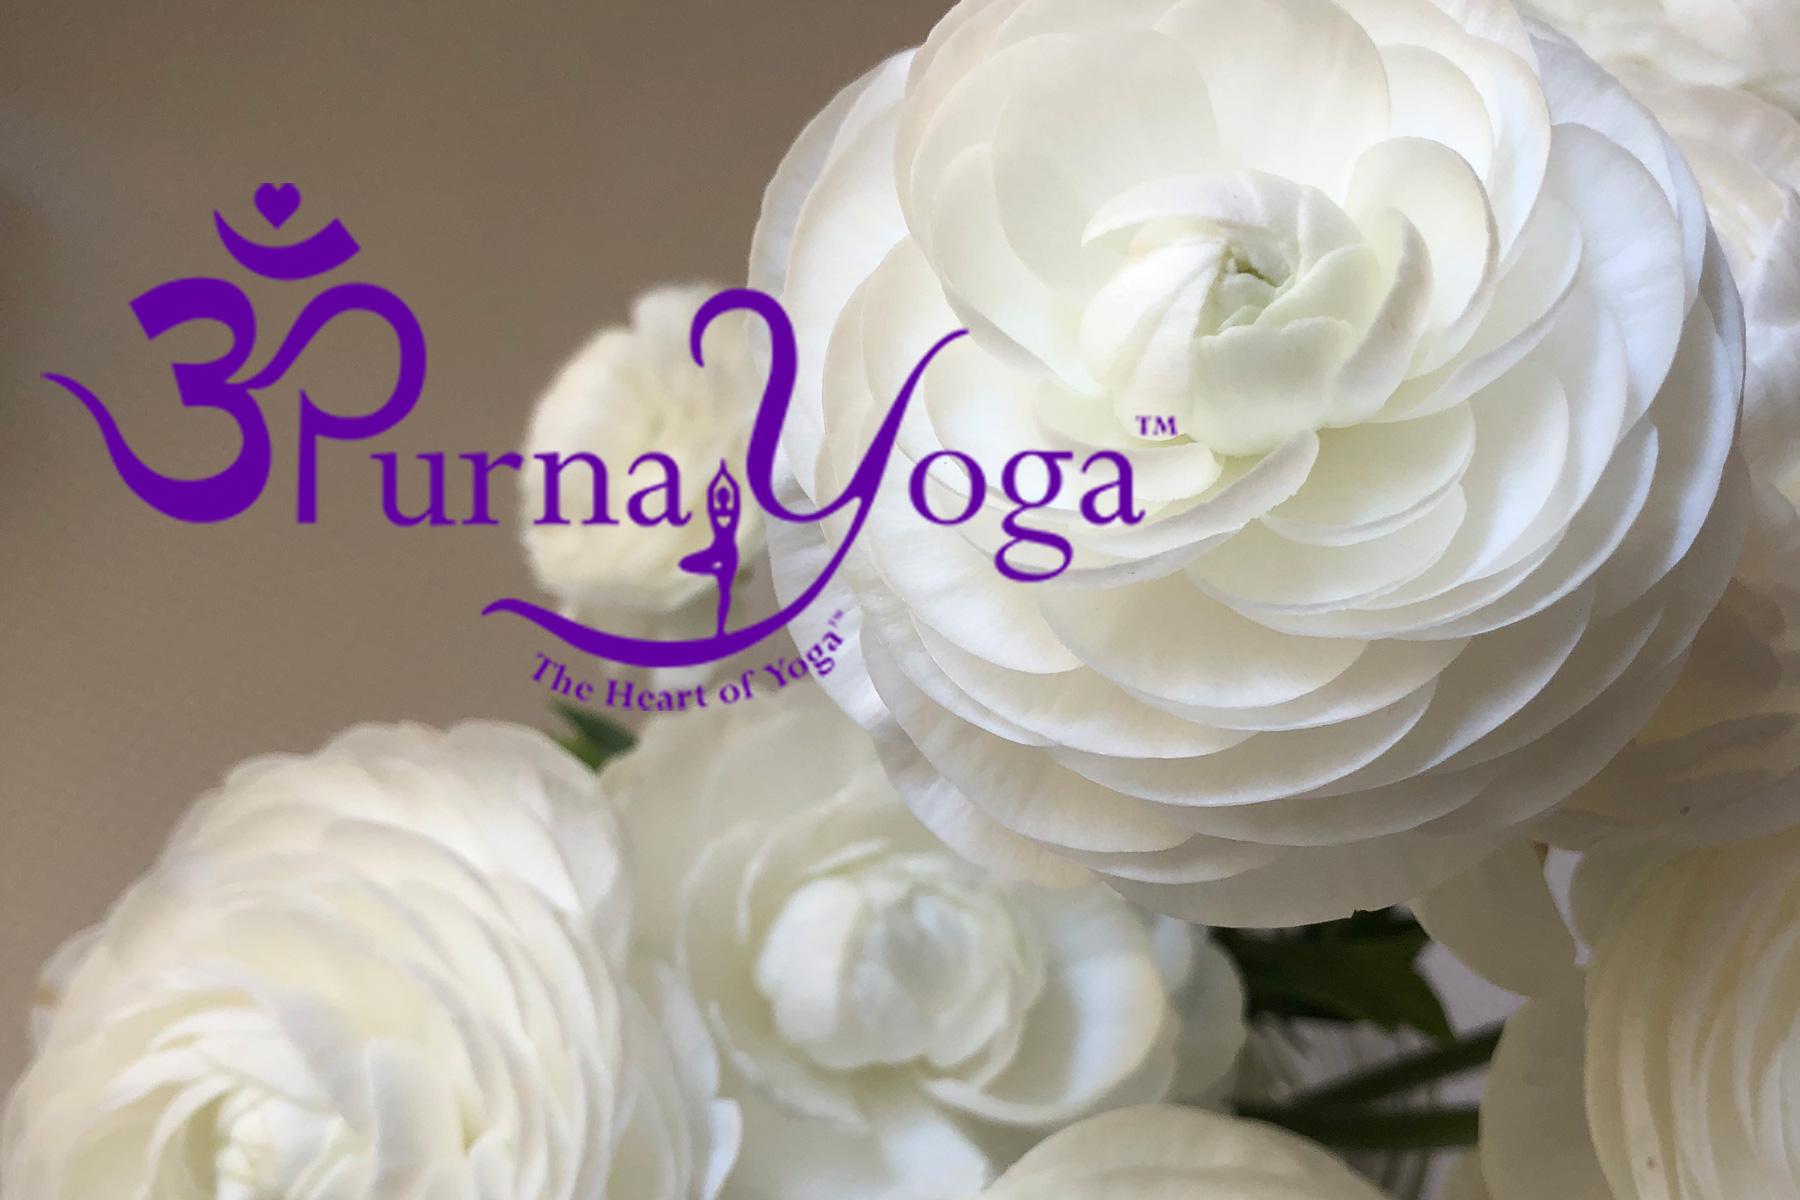 Purna Yoga College Teacher Training